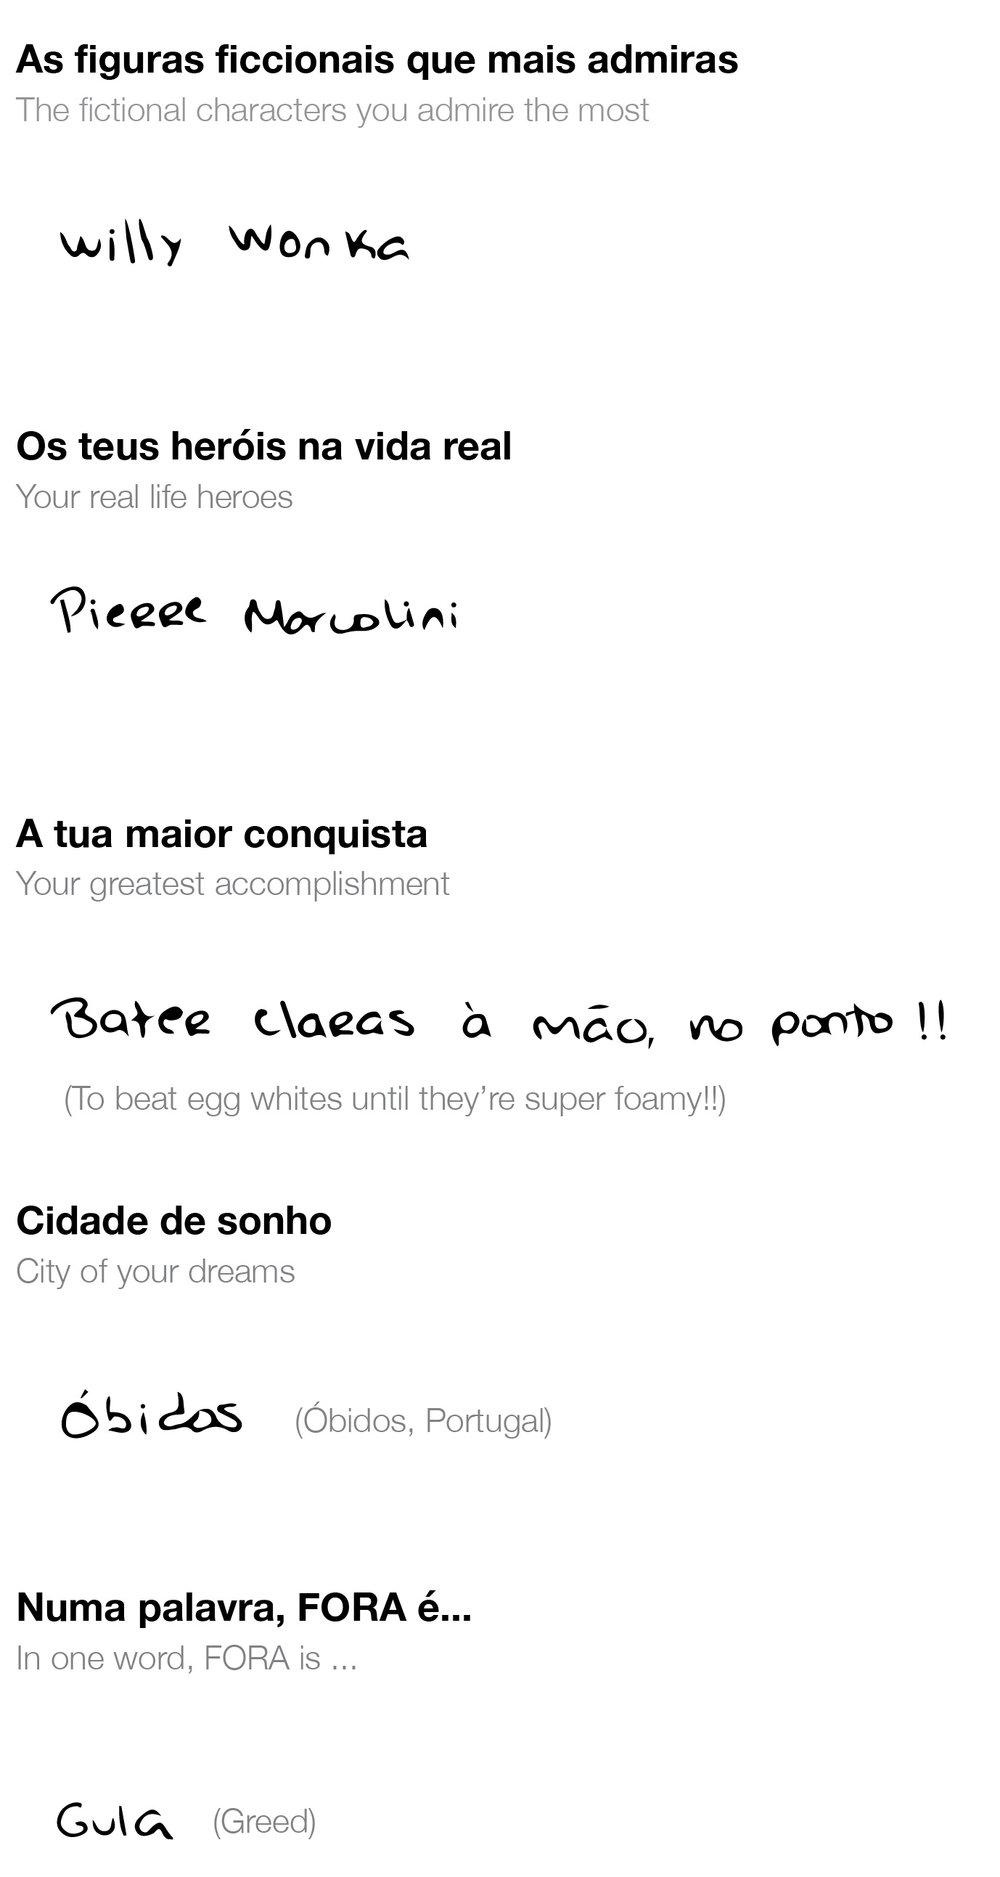 proust_maria_imaginário-02.jpg